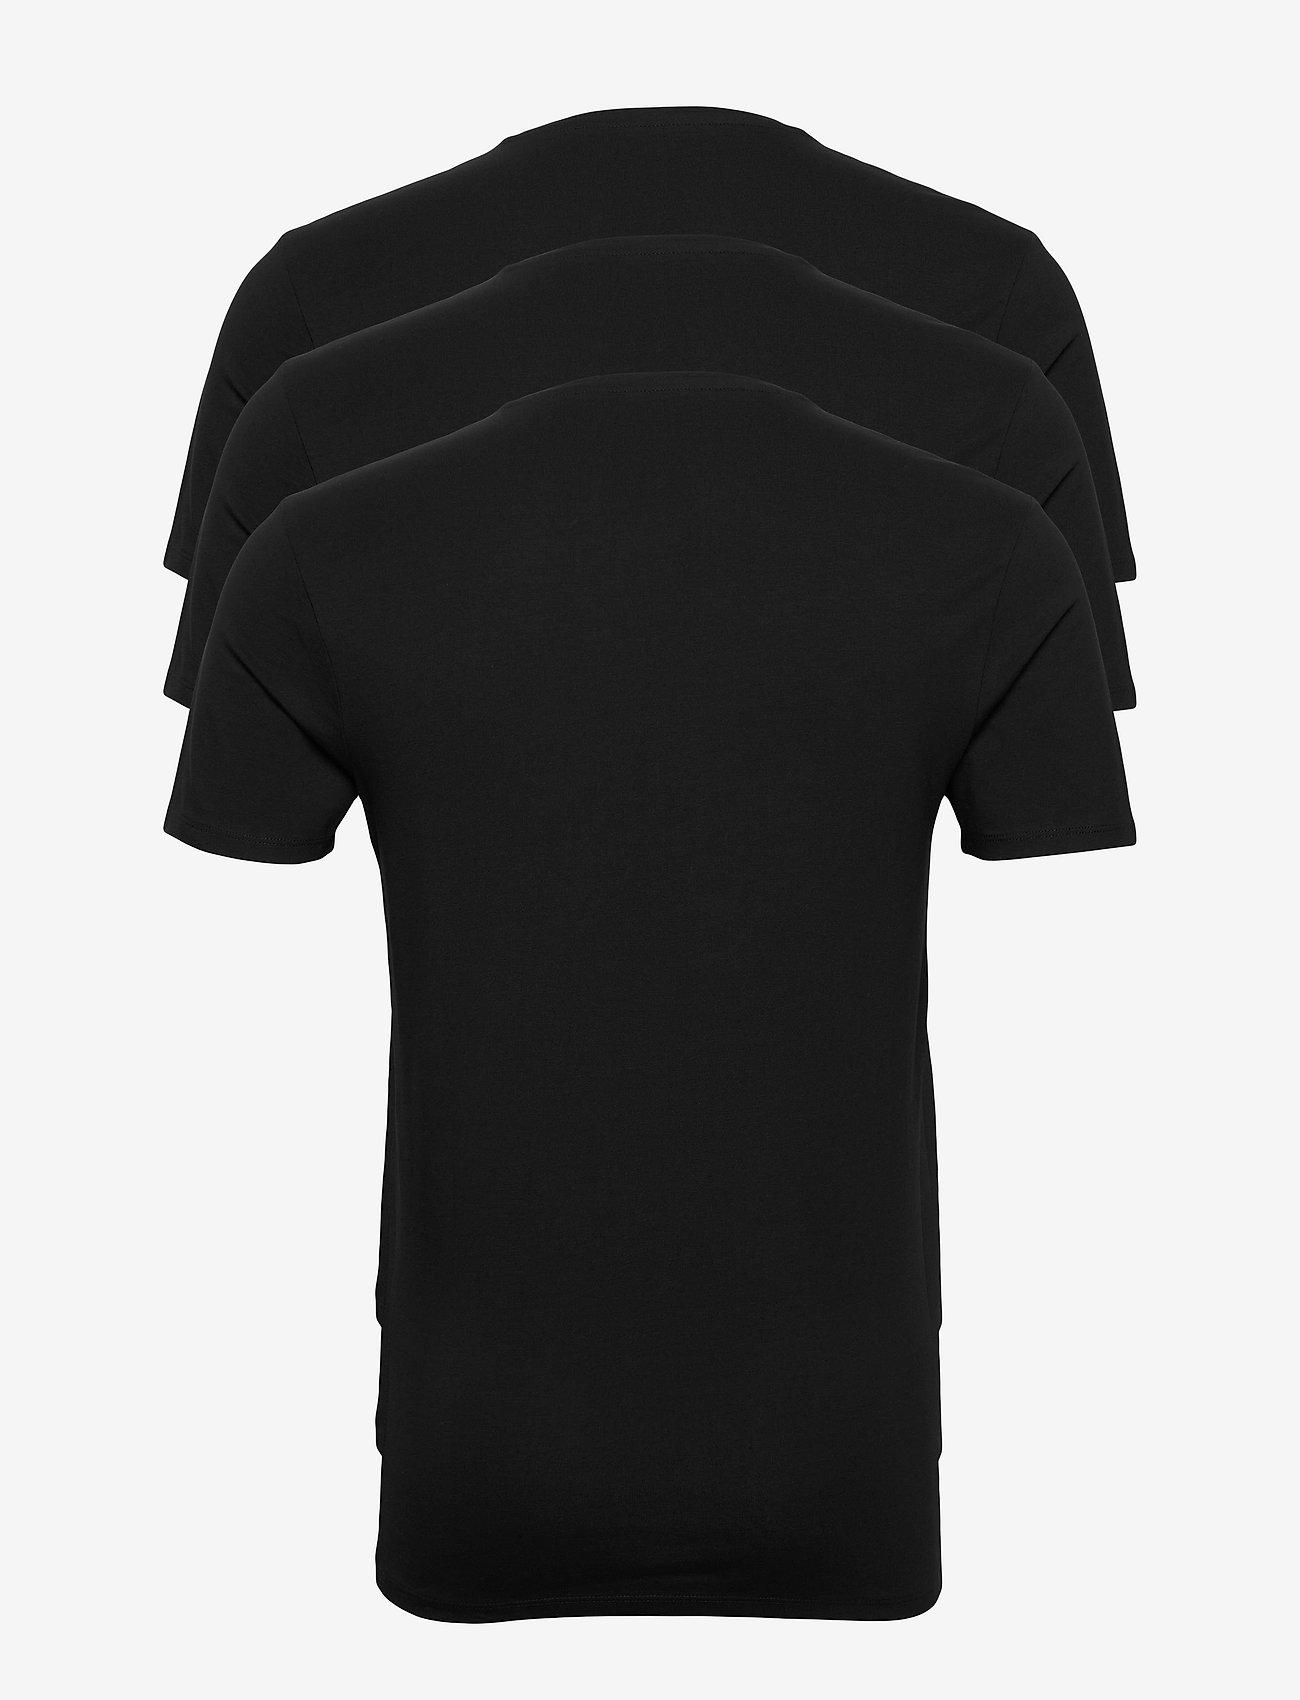 Selected Homme - SLHNEWPIMA SS O-NECK TEE B 3 PACK - basic t-shirts - black - 1